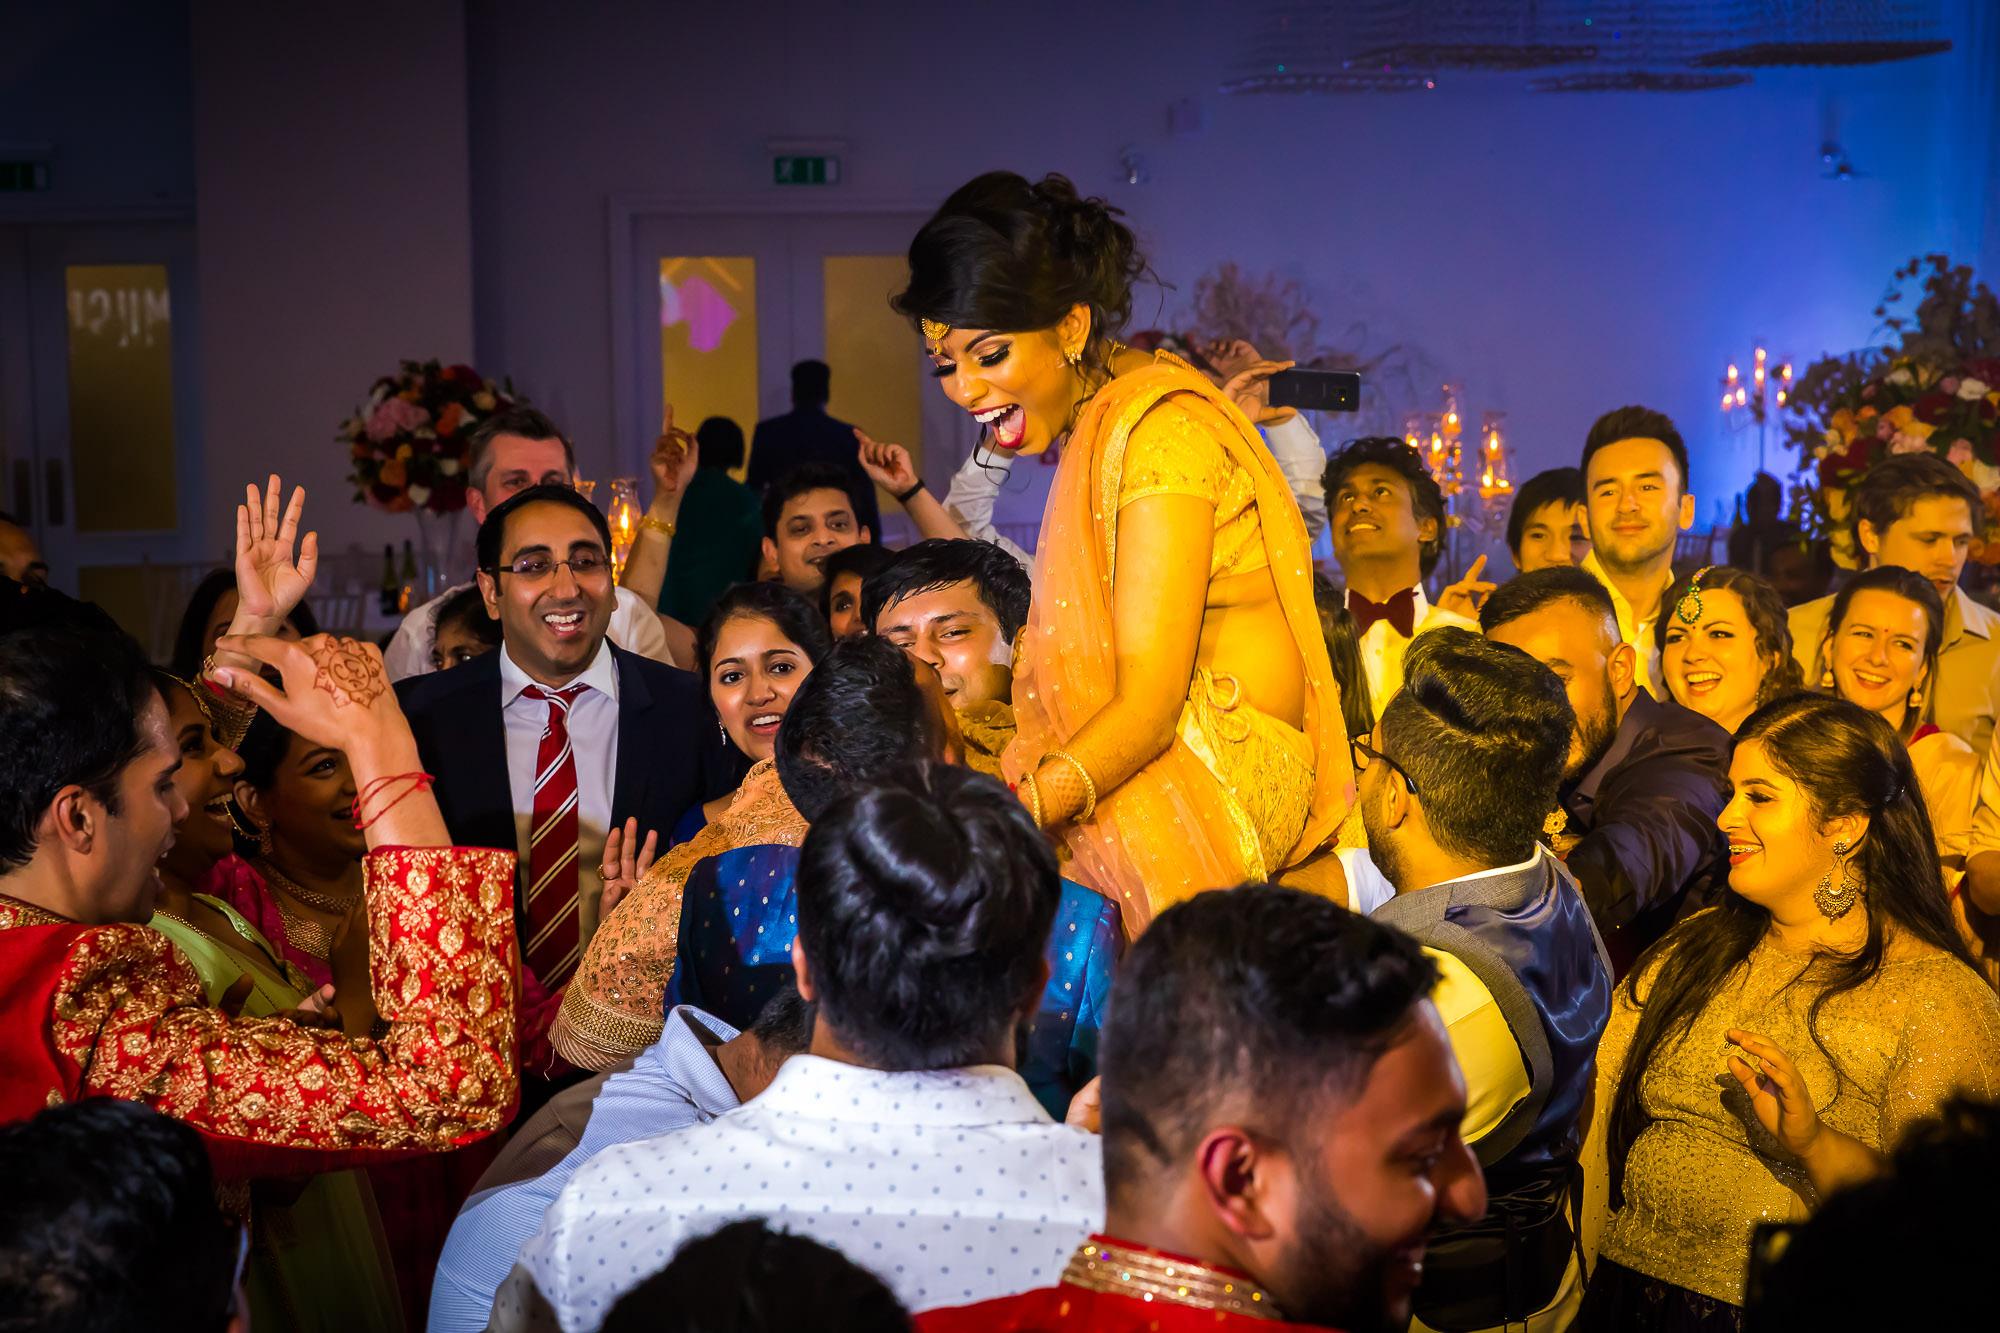 asian-wedding-hindu-tamil-photographer-heythorpe-oxford-0145.jpg